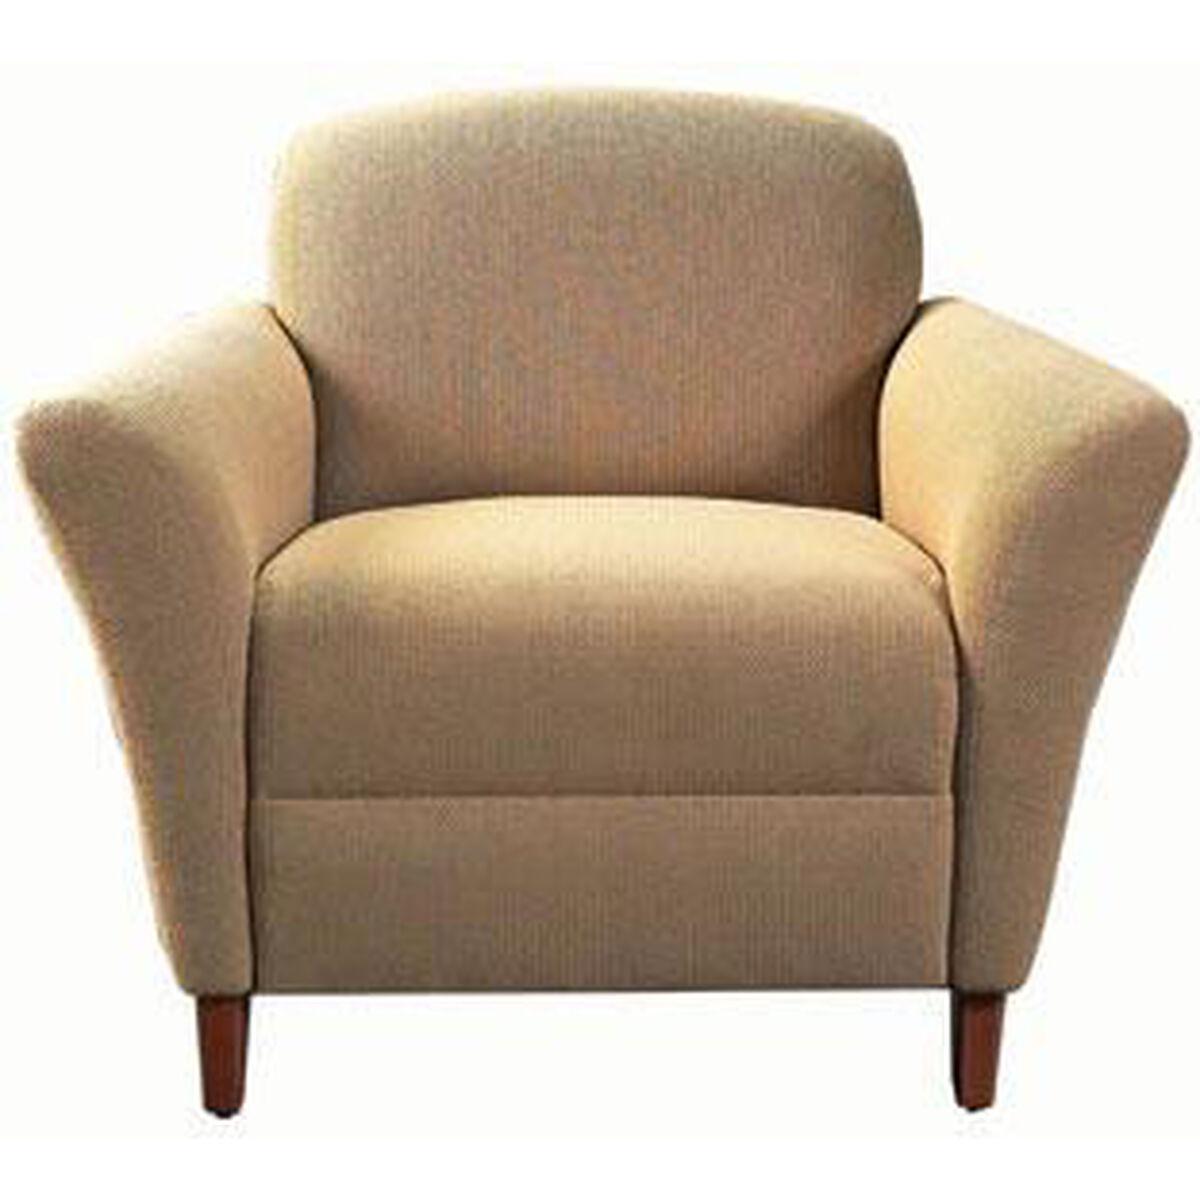 High Point Furniture Industries 6201 Hpf 6201